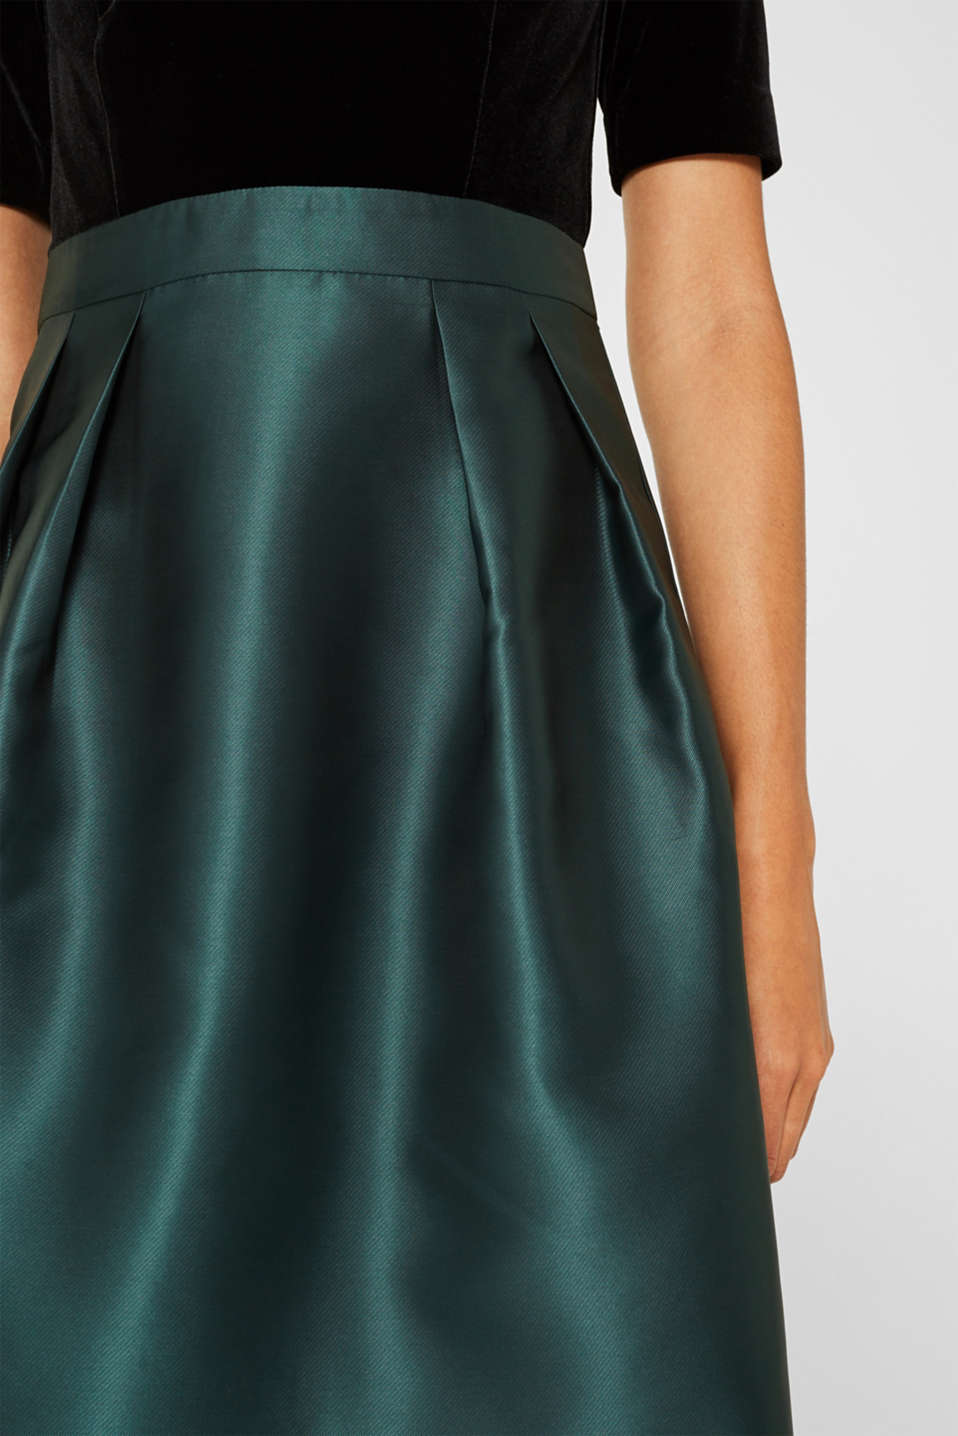 Dress made of velvet and satin, DARK TEAL GREEN, detail image number 2